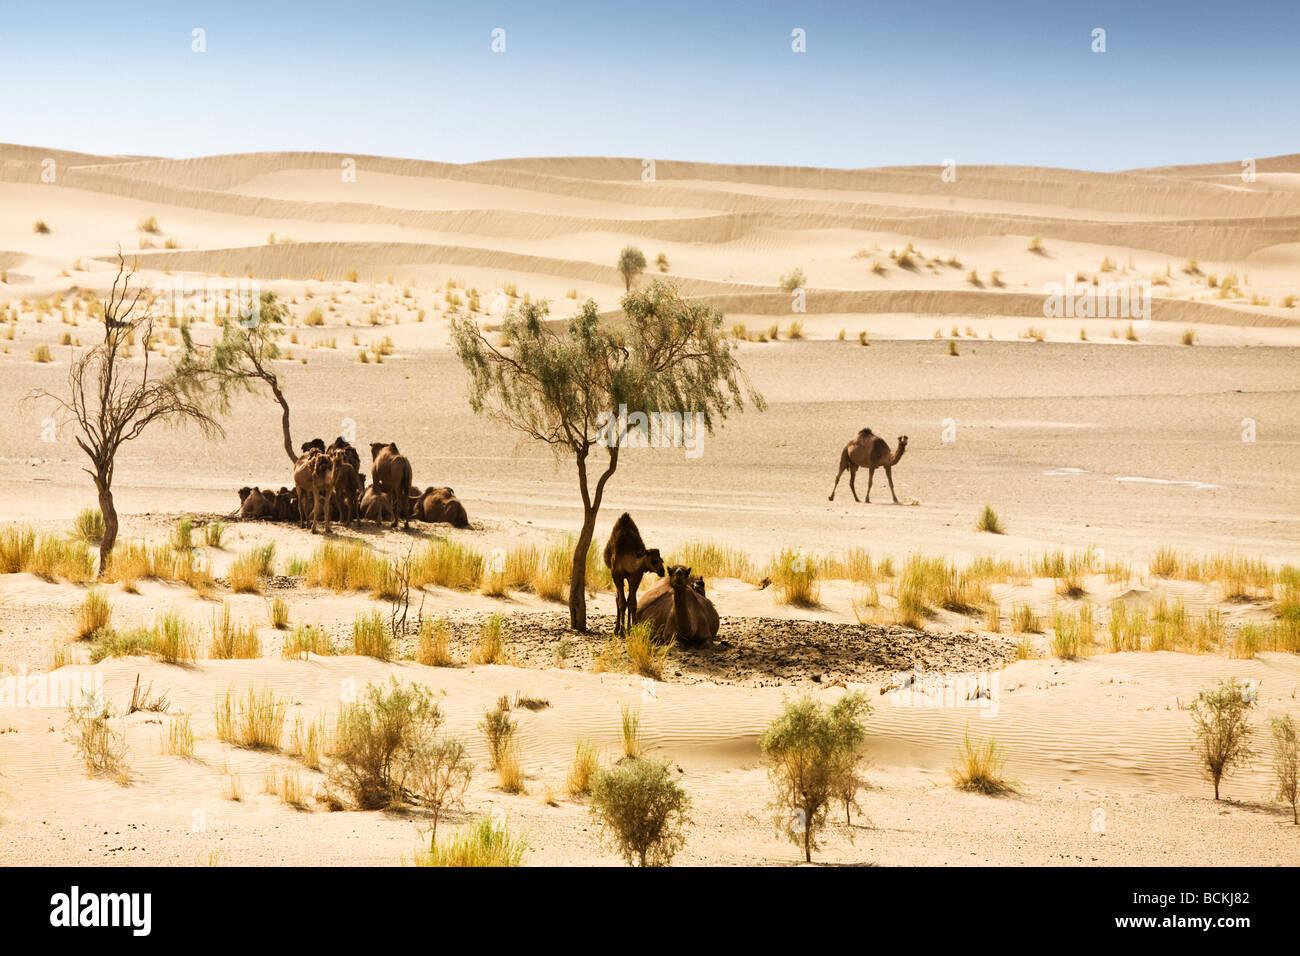 Camels sheltering under trees in desert - Stock Image